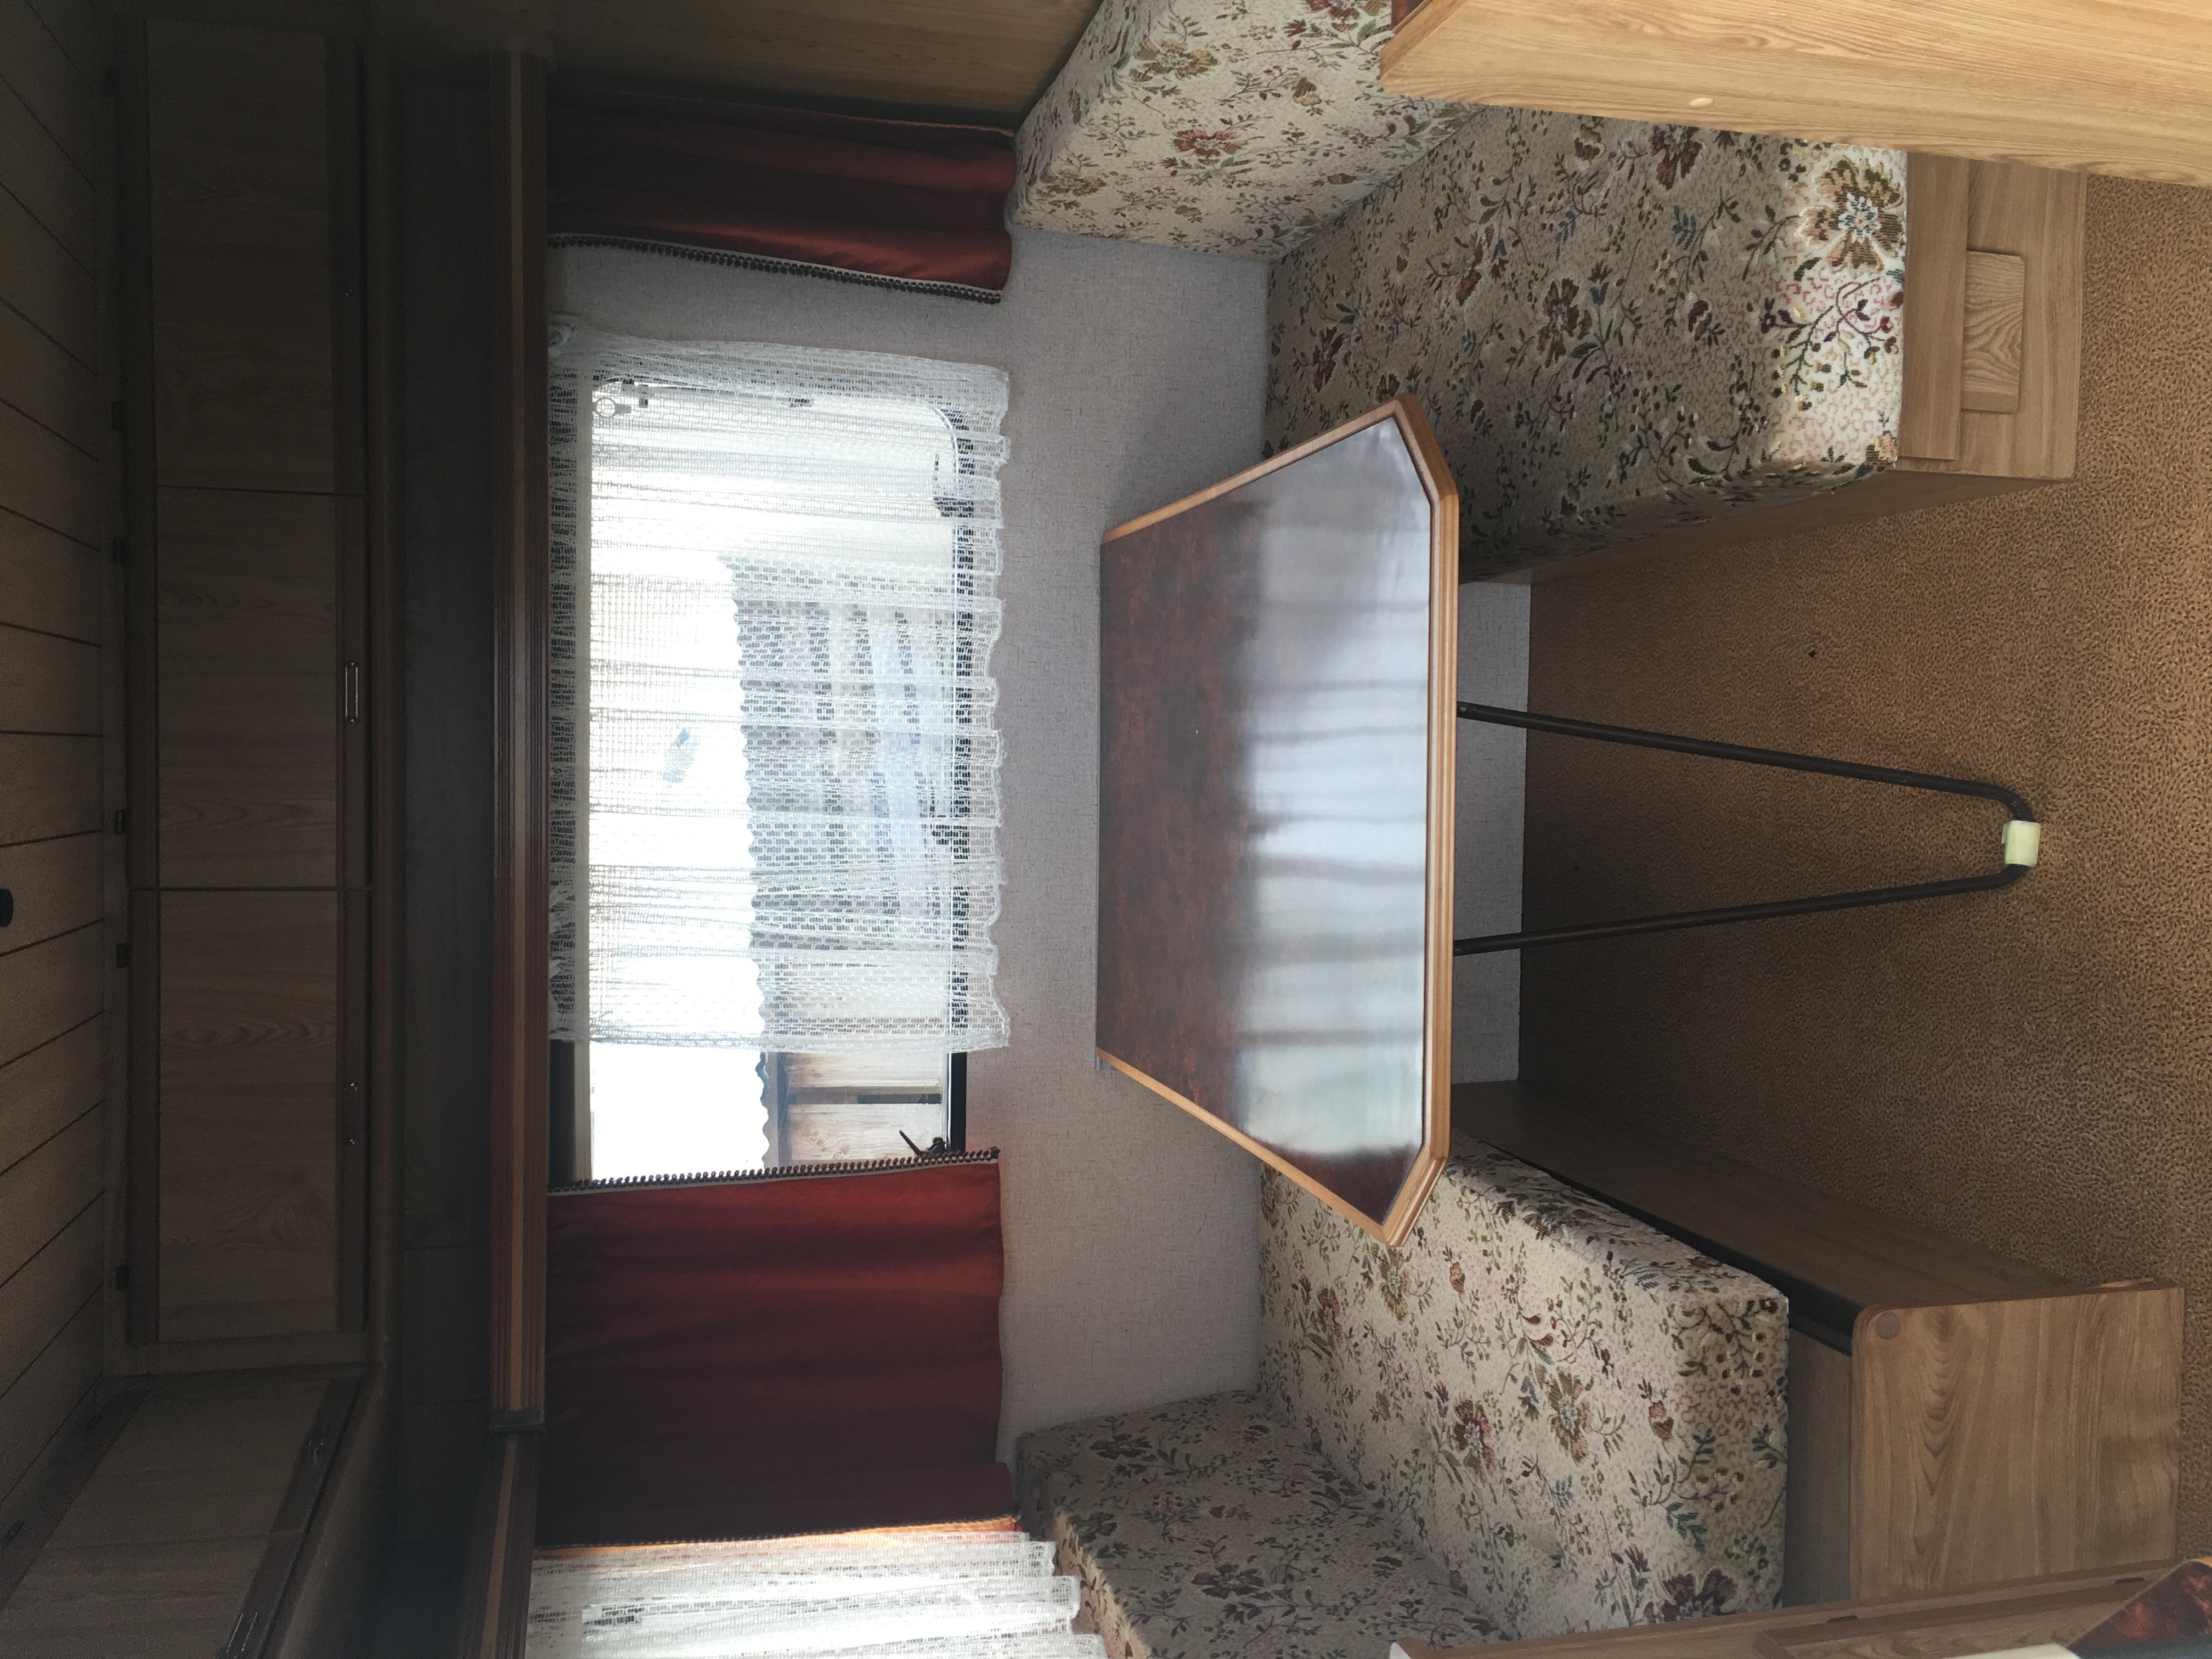 caravelair 450 brasilia occasion 2850 id n 11012. Black Bedroom Furniture Sets. Home Design Ideas